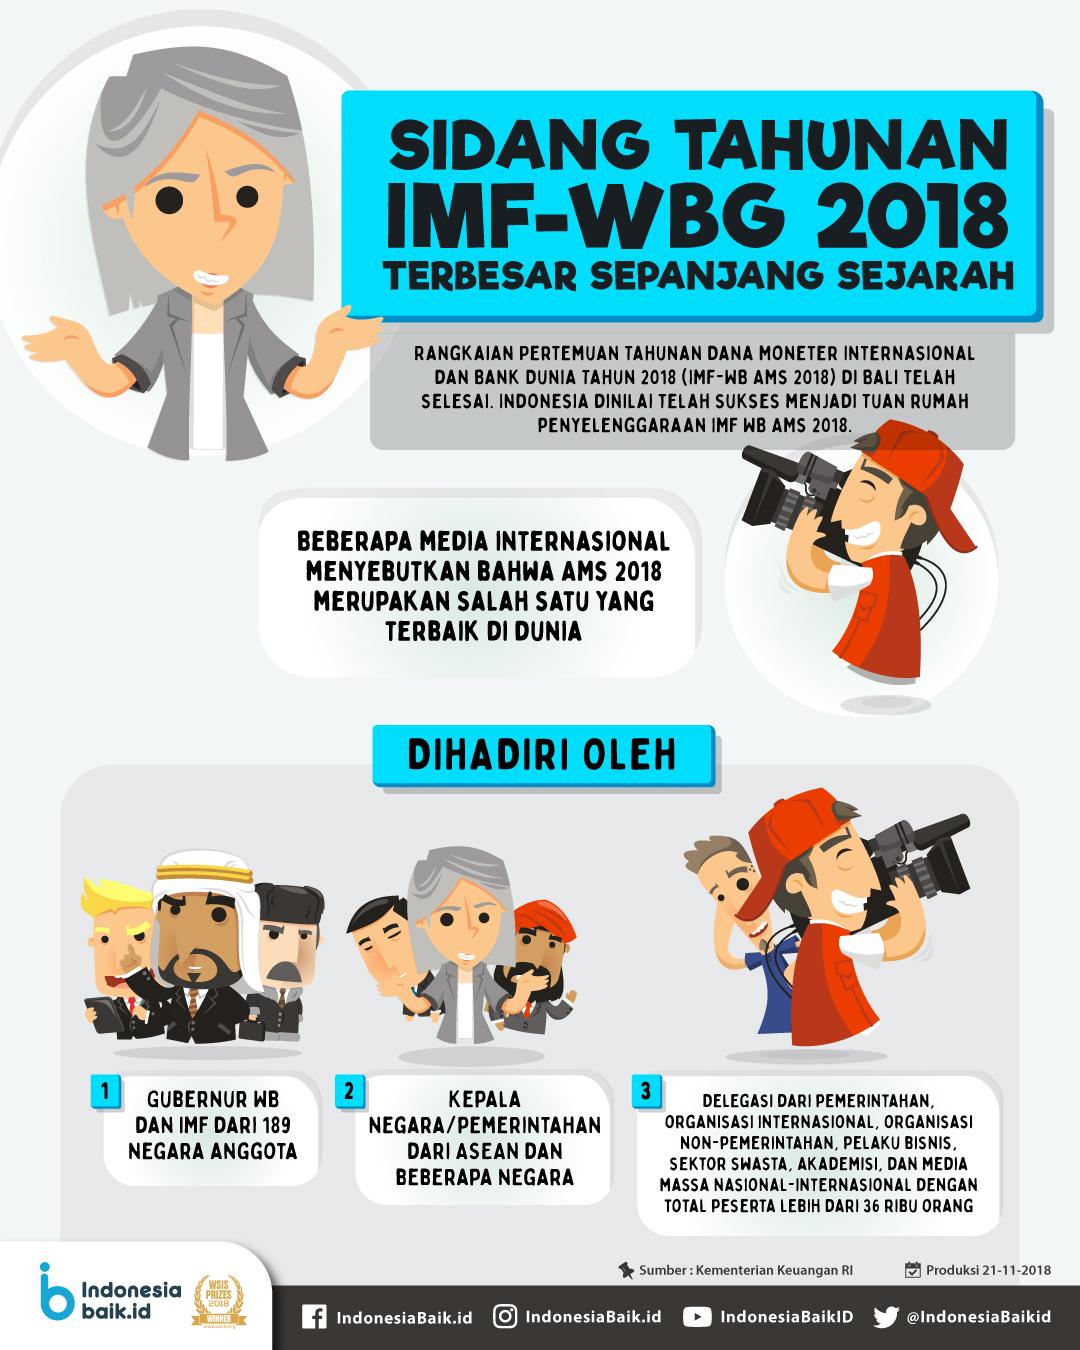 Sidang Tahunan IMF-WBG 2018,  Terbesar Sepanjang Sejarah